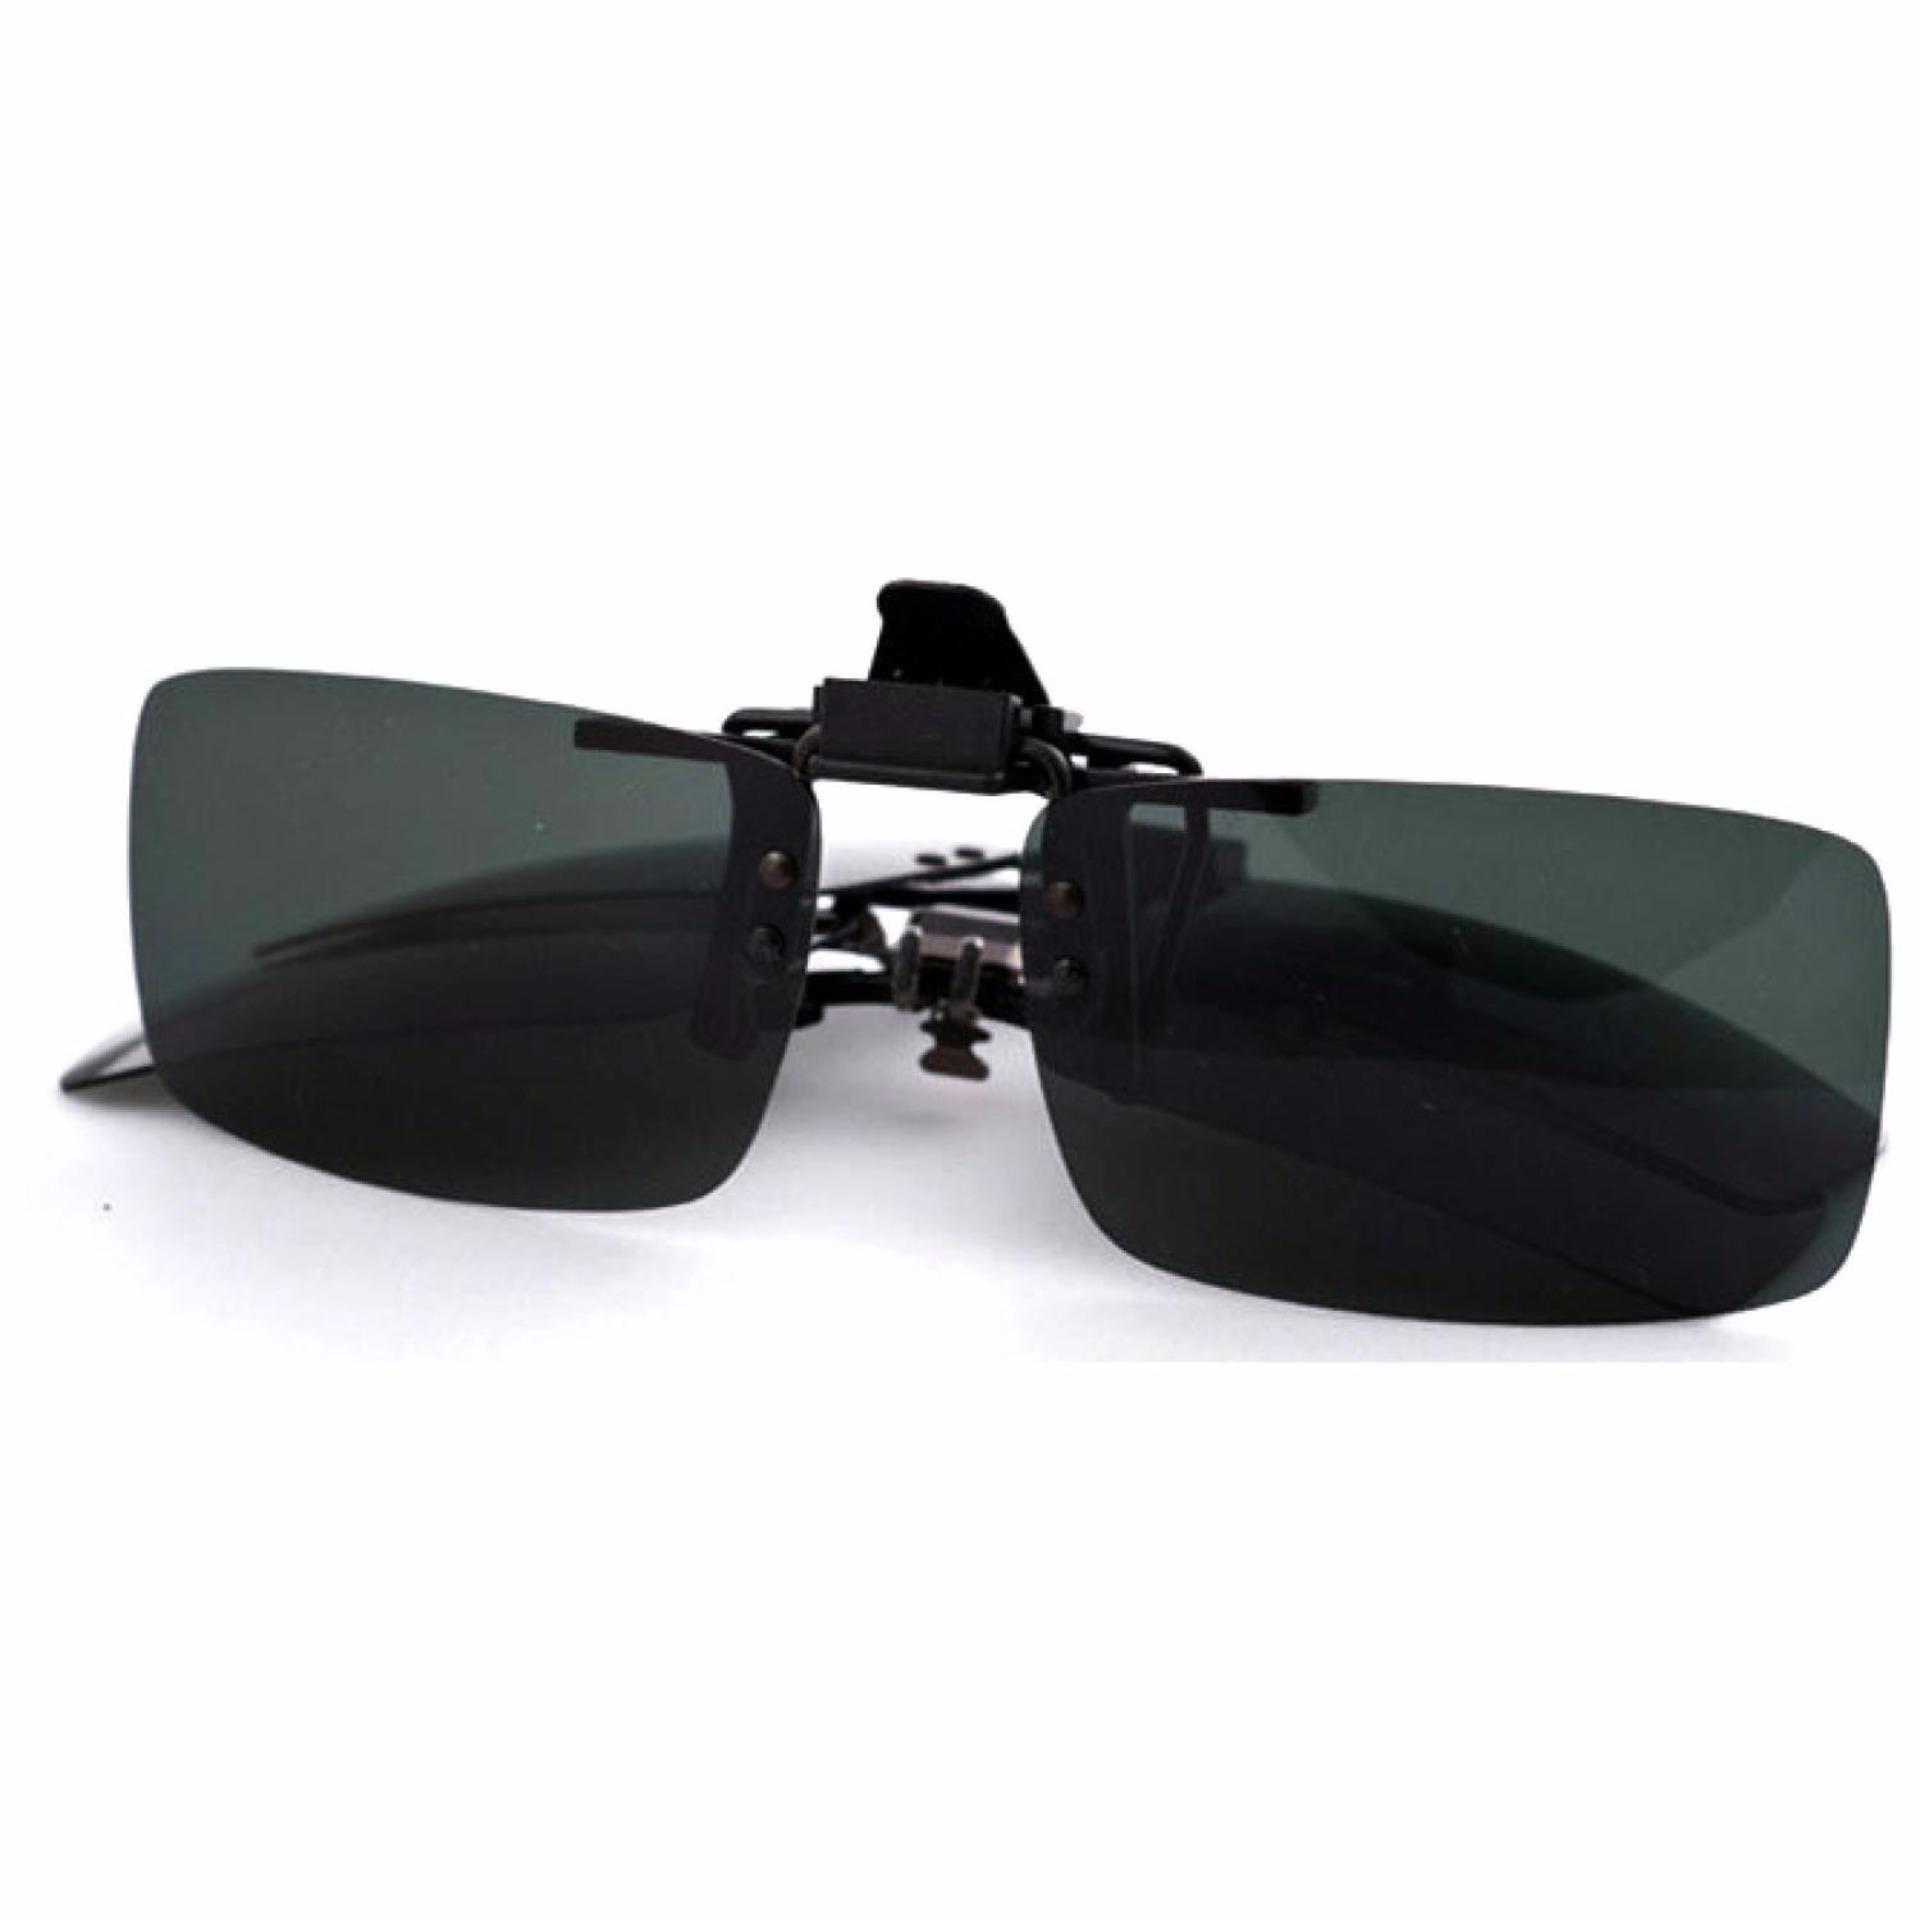 Bigbos Store Kacamata Anti Silau Night View Daftar Harga Terbaru Universal  Lensa Jepit Day Vision For 99faed30af